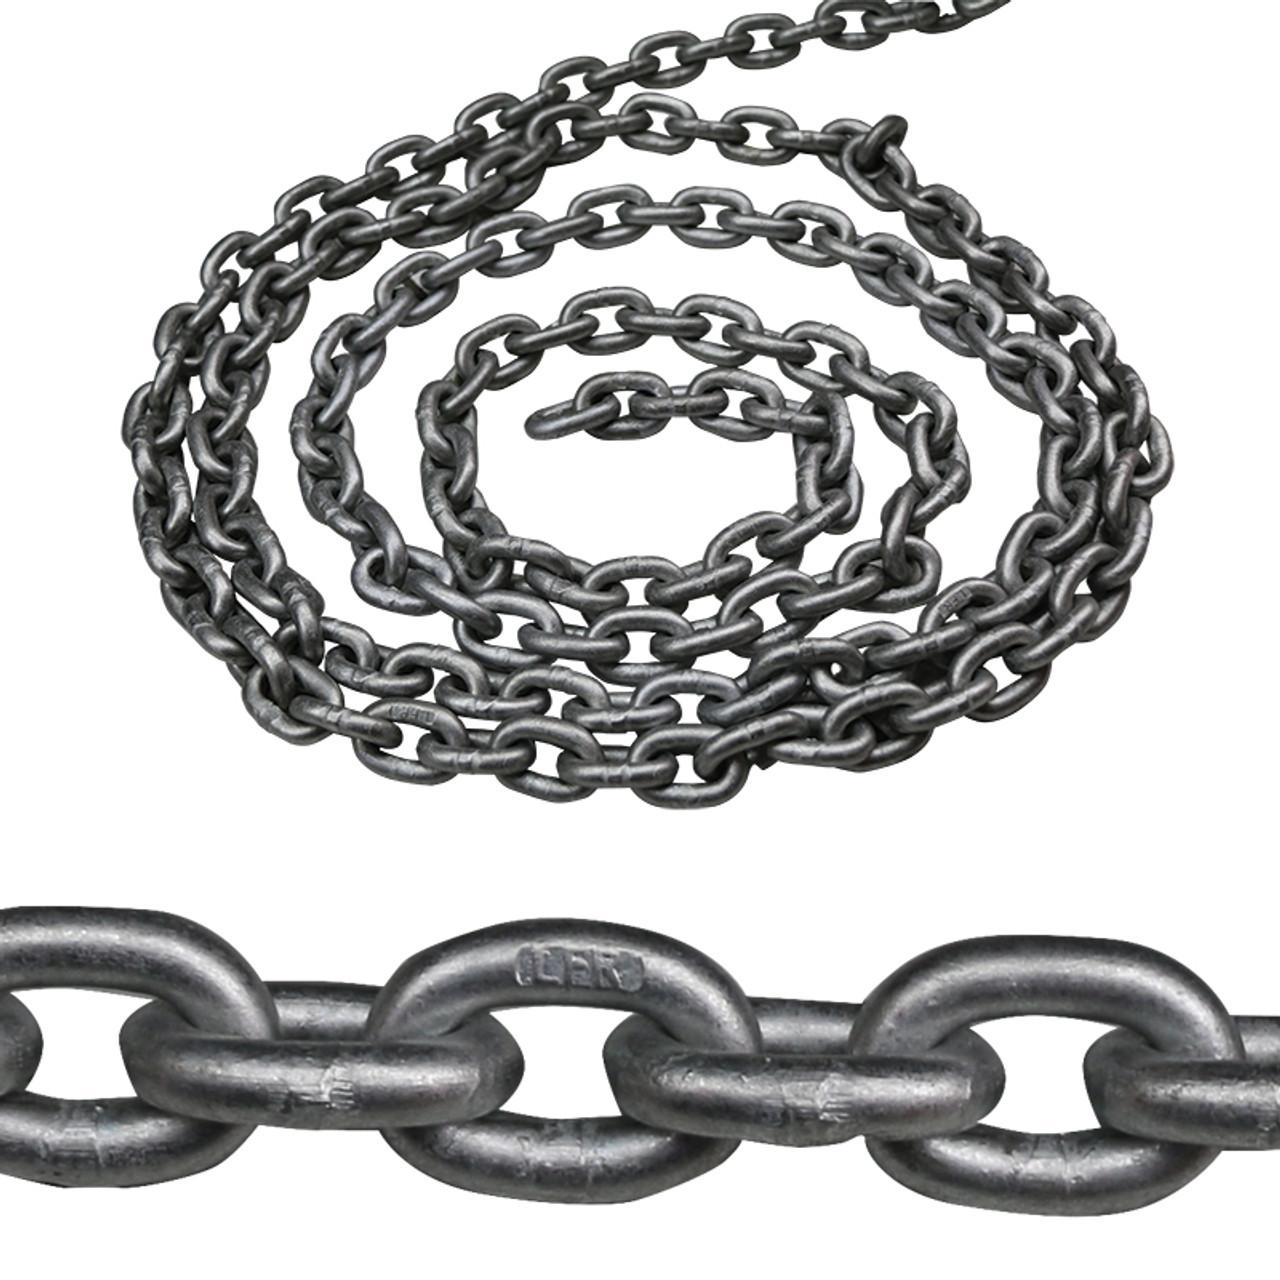 Chain - Lofrans' Hot Dipped 12mm x 1metre